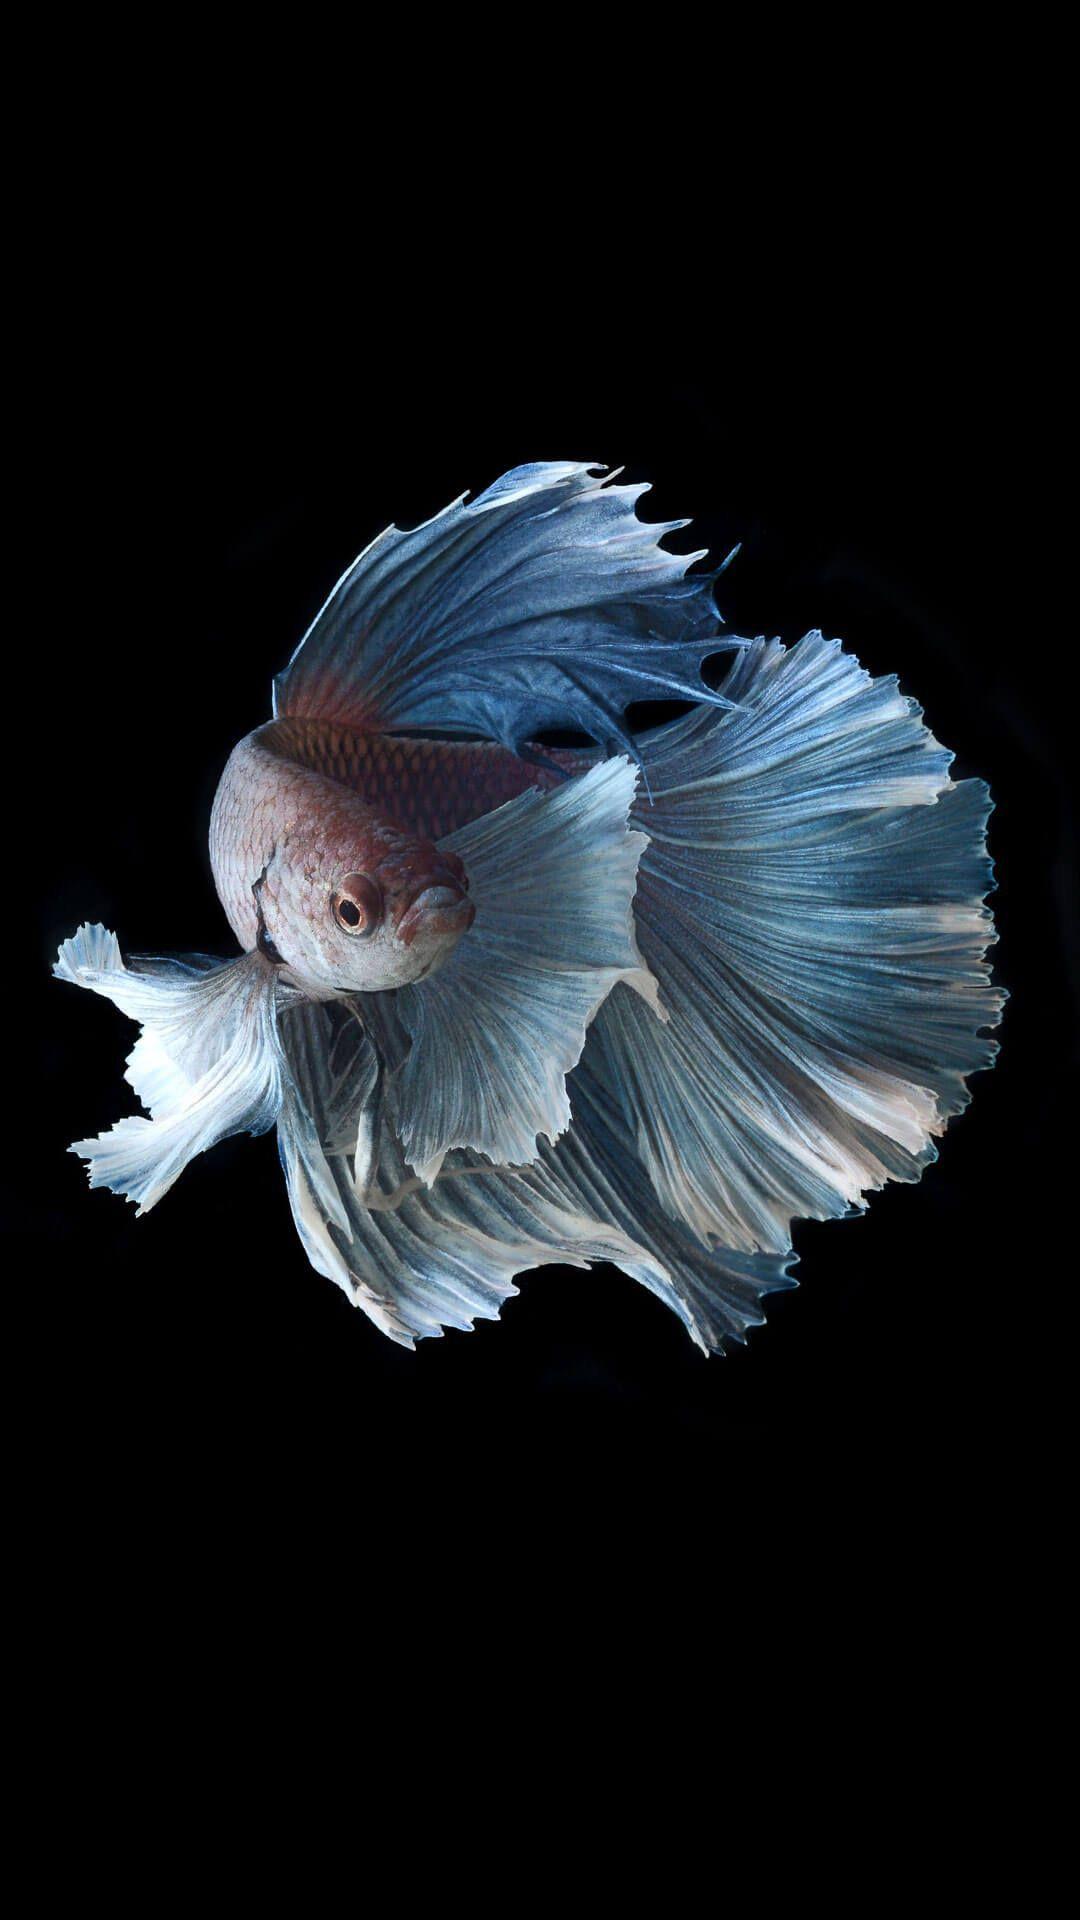 Wallpaper Iphone 6 Plus Fish Sharovarka